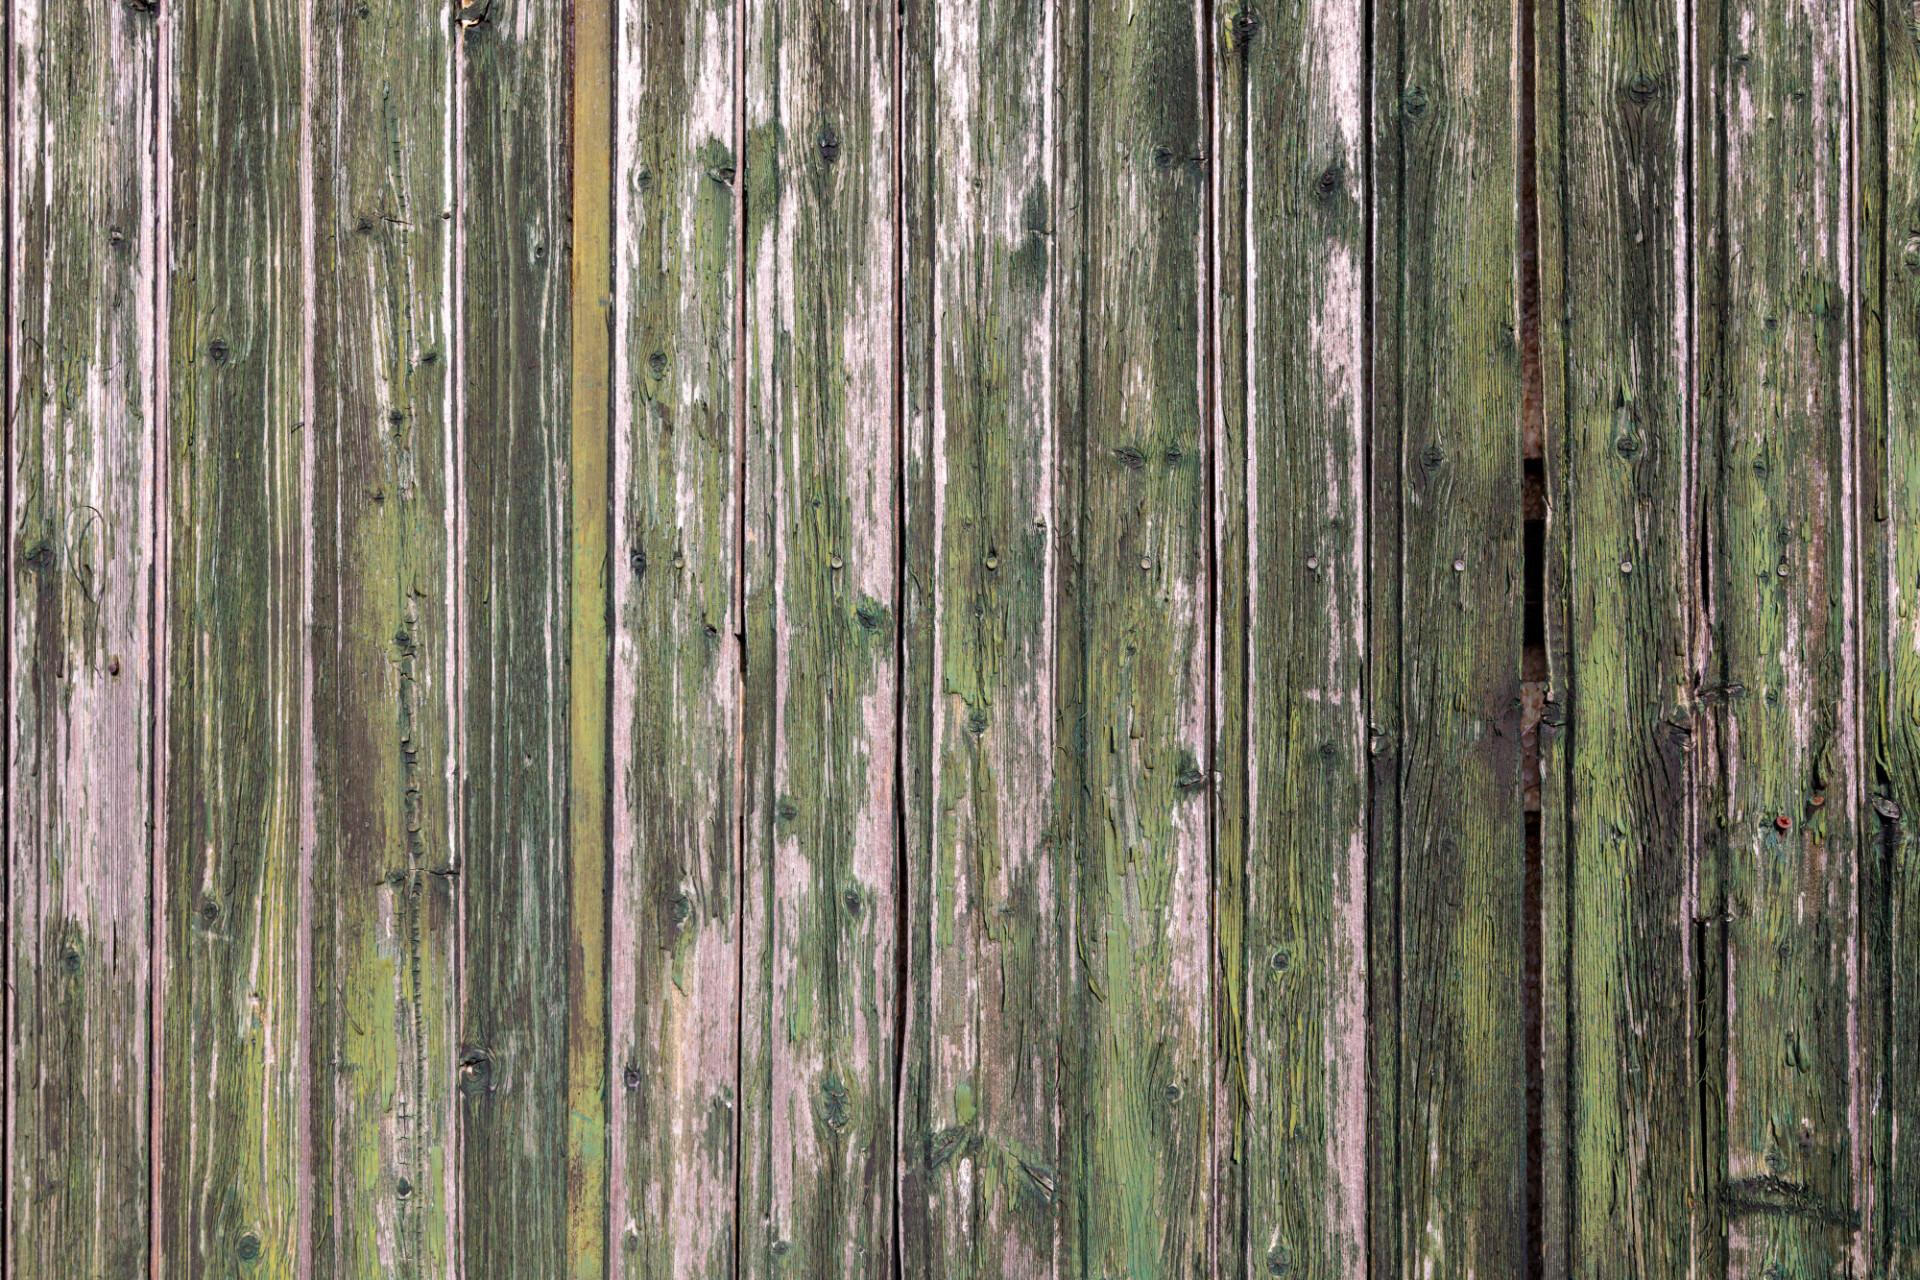 weathered green wood slats texture